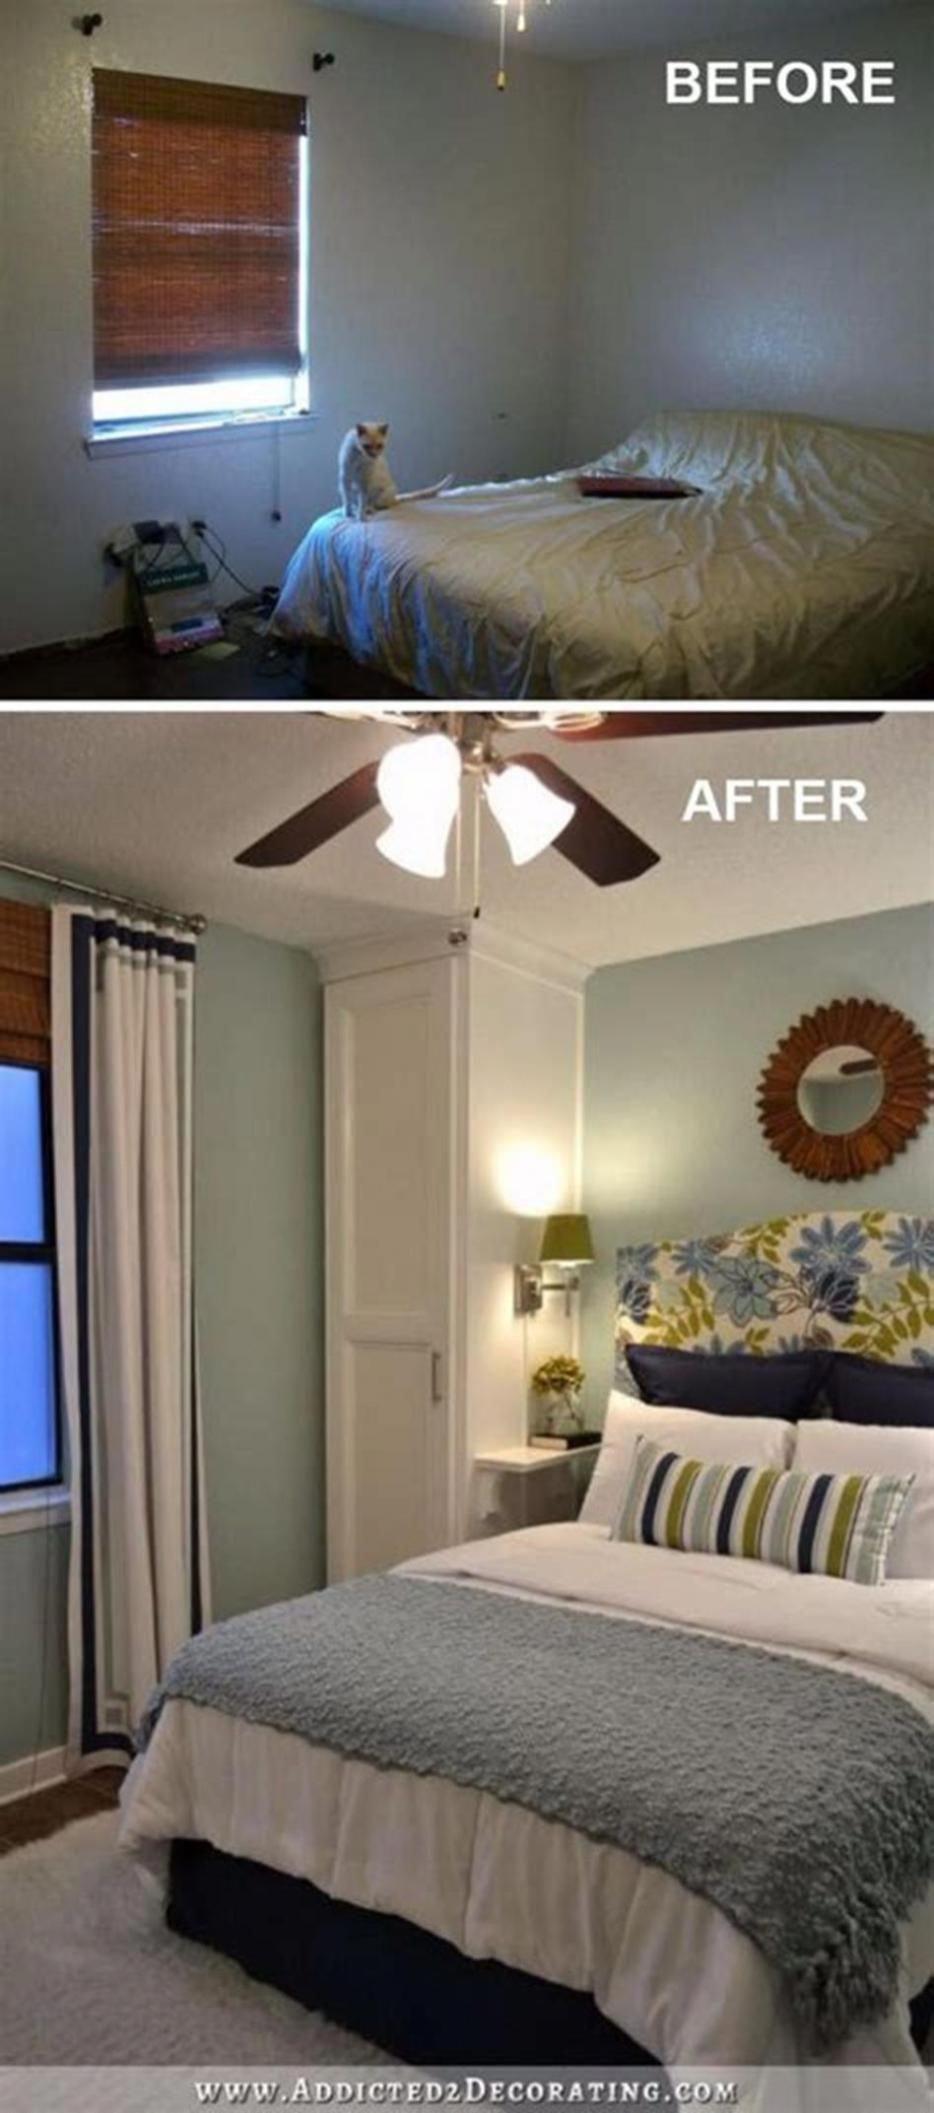 Best 55 Amazing Small Master Bedroom Decorating Design Ideas On 400 x 300